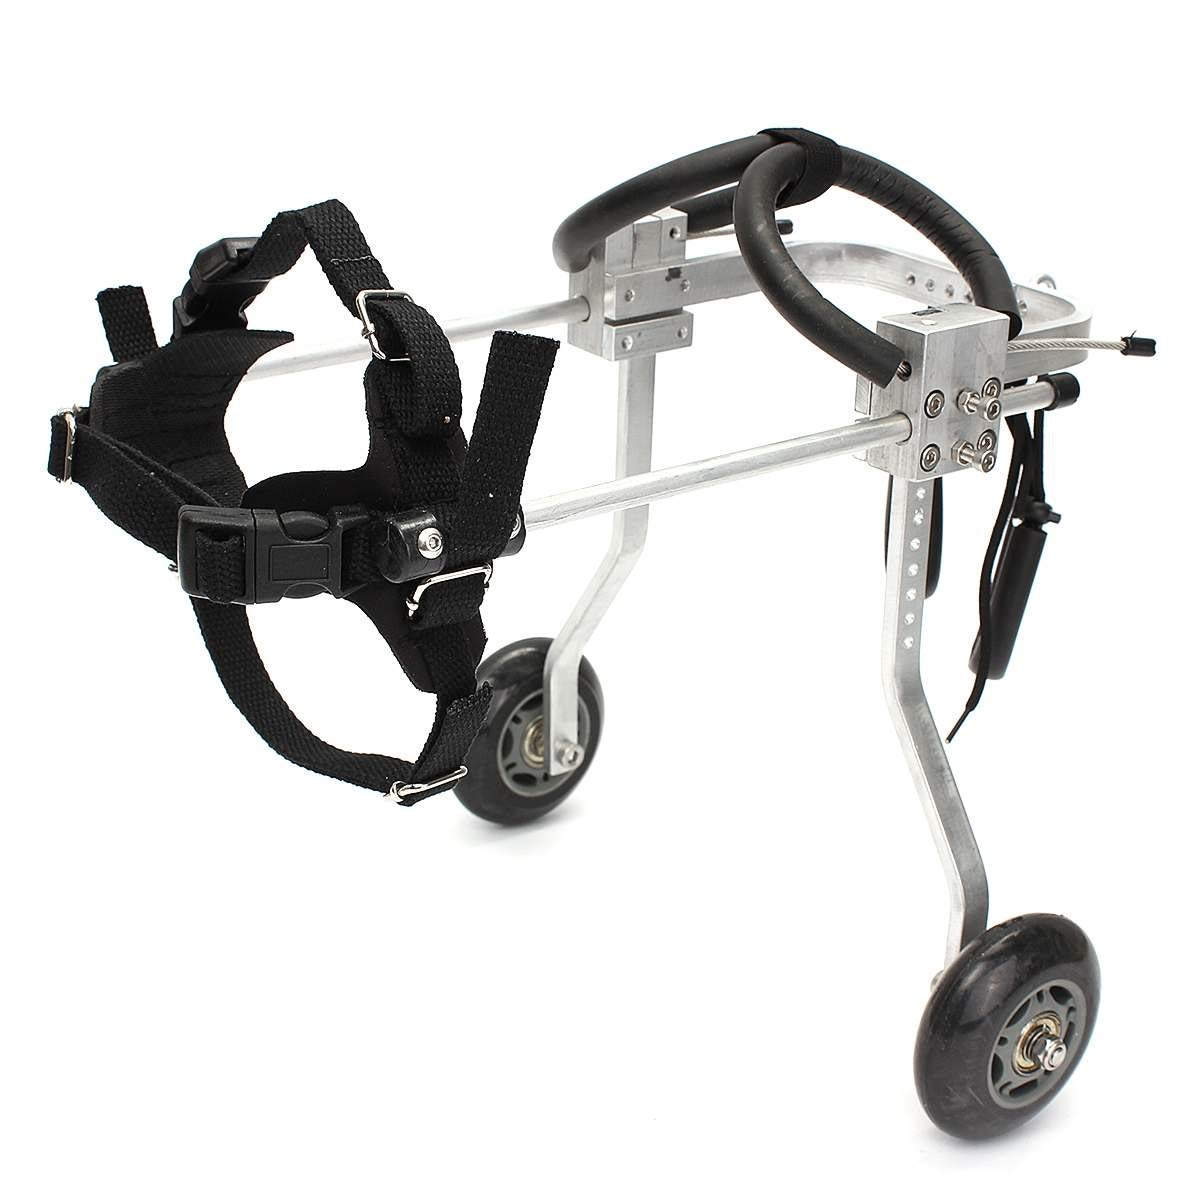 DUANJY Pet Wheelchair Professional Pet Dog Wheelchair, Handicapped Paralyzed Pet Wheelchair for Disabled Cat Dog Rehabilitation,2 round XXS Multiple